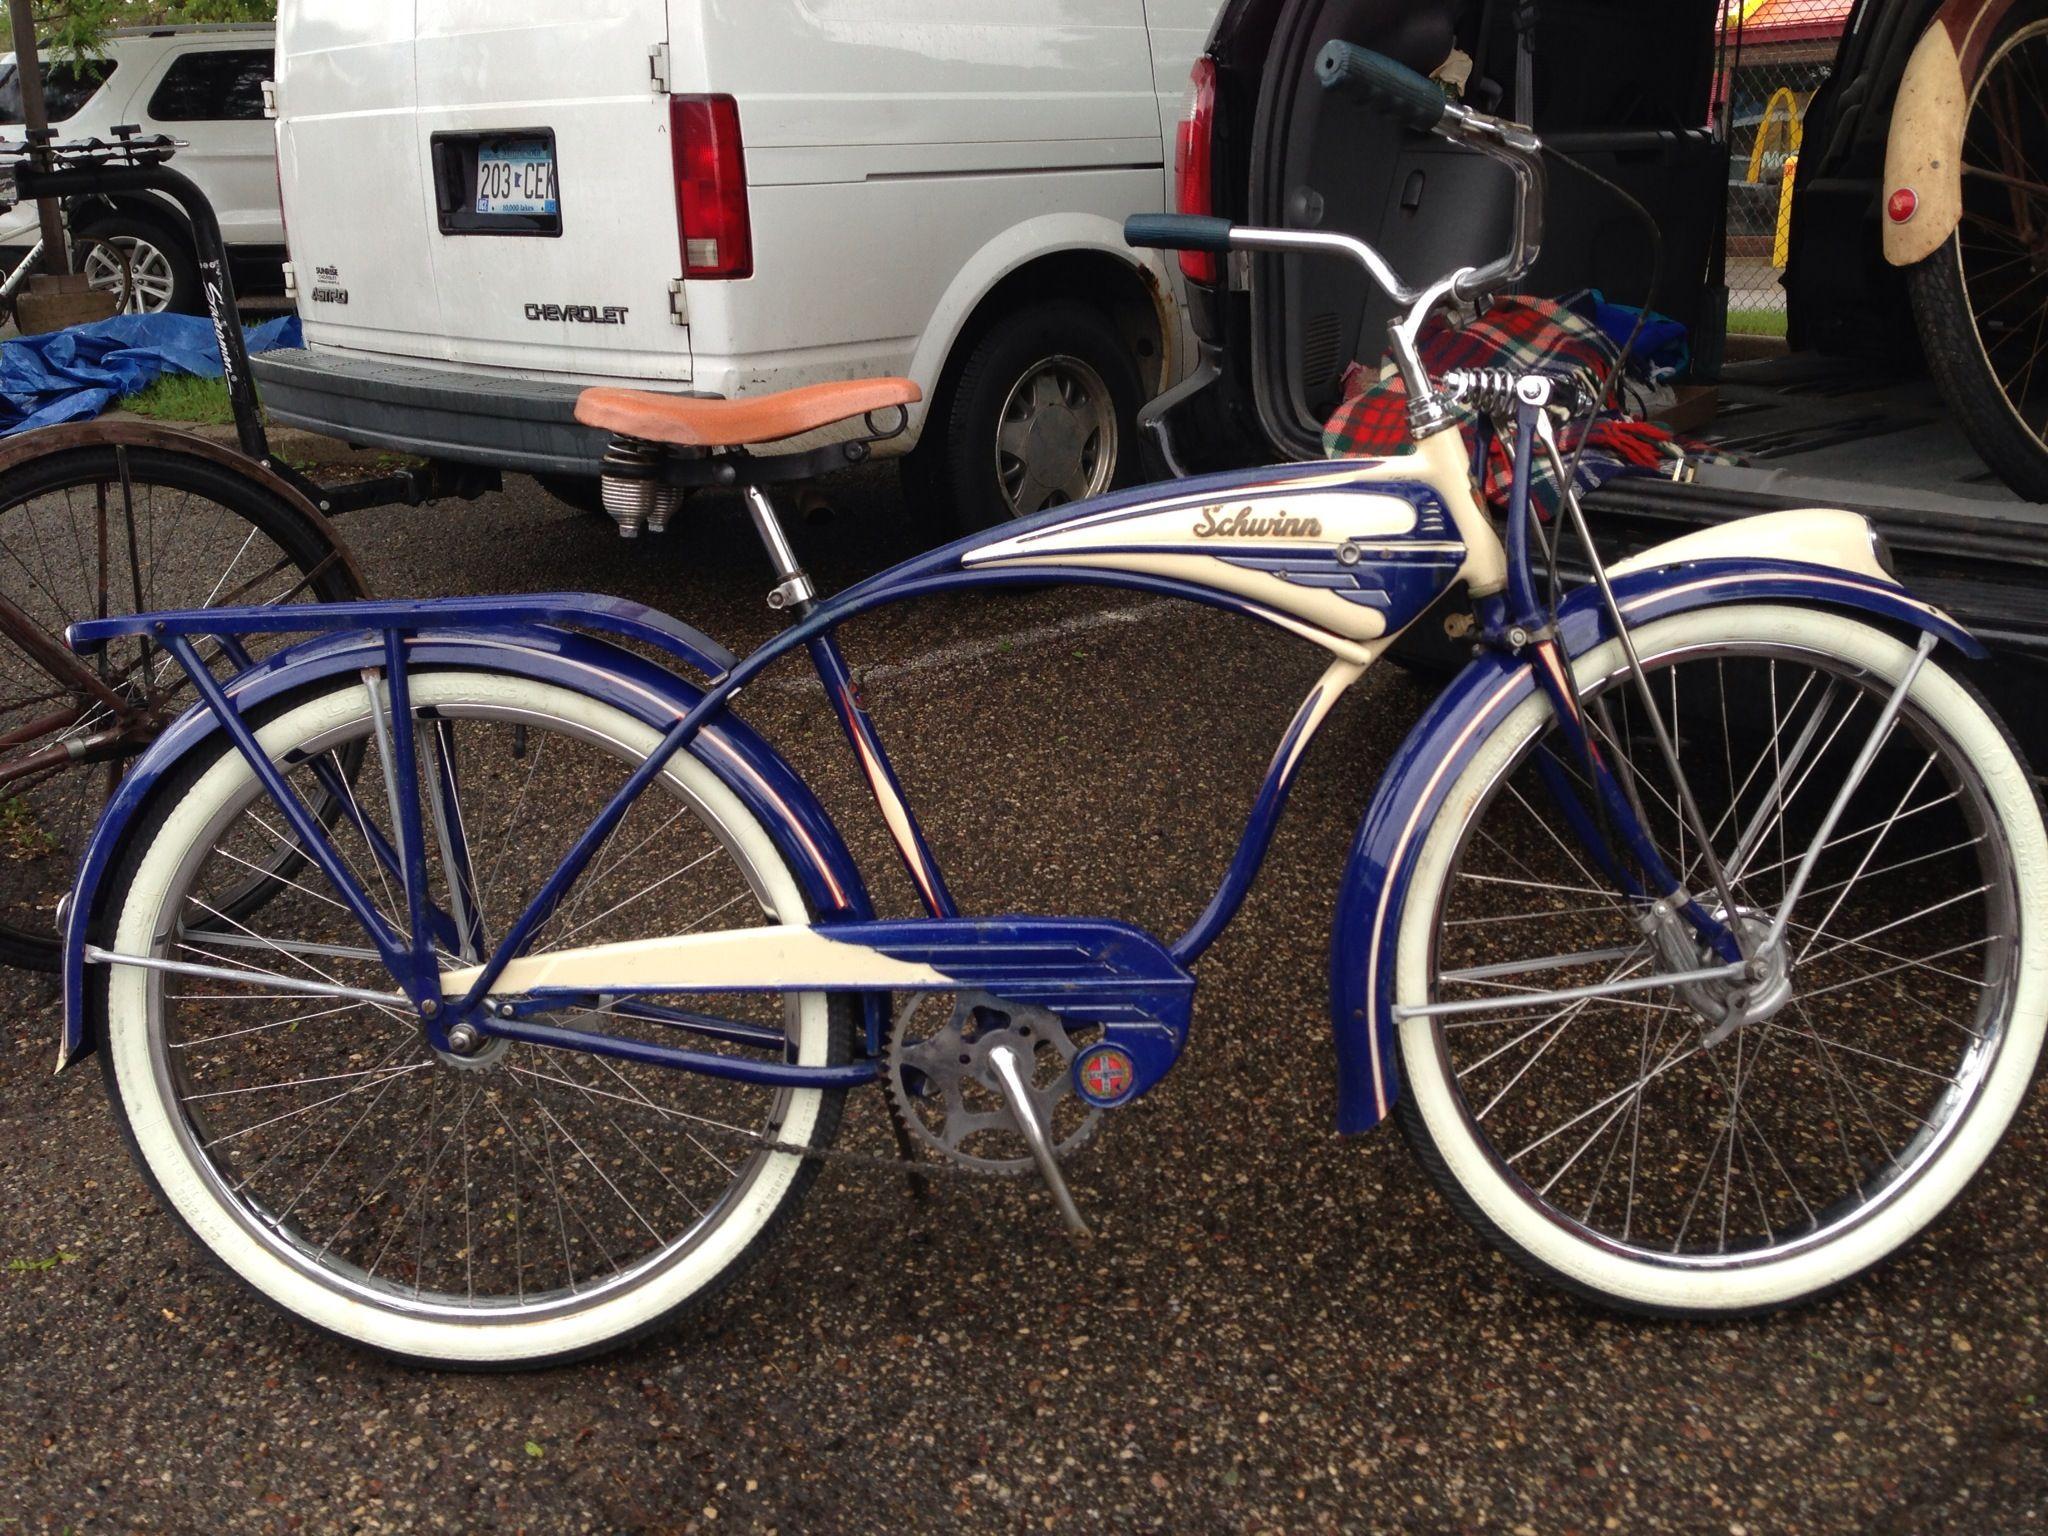 Schwinn Bicycle Schwinn Bike Retro Bicycle Vintage Bicycles